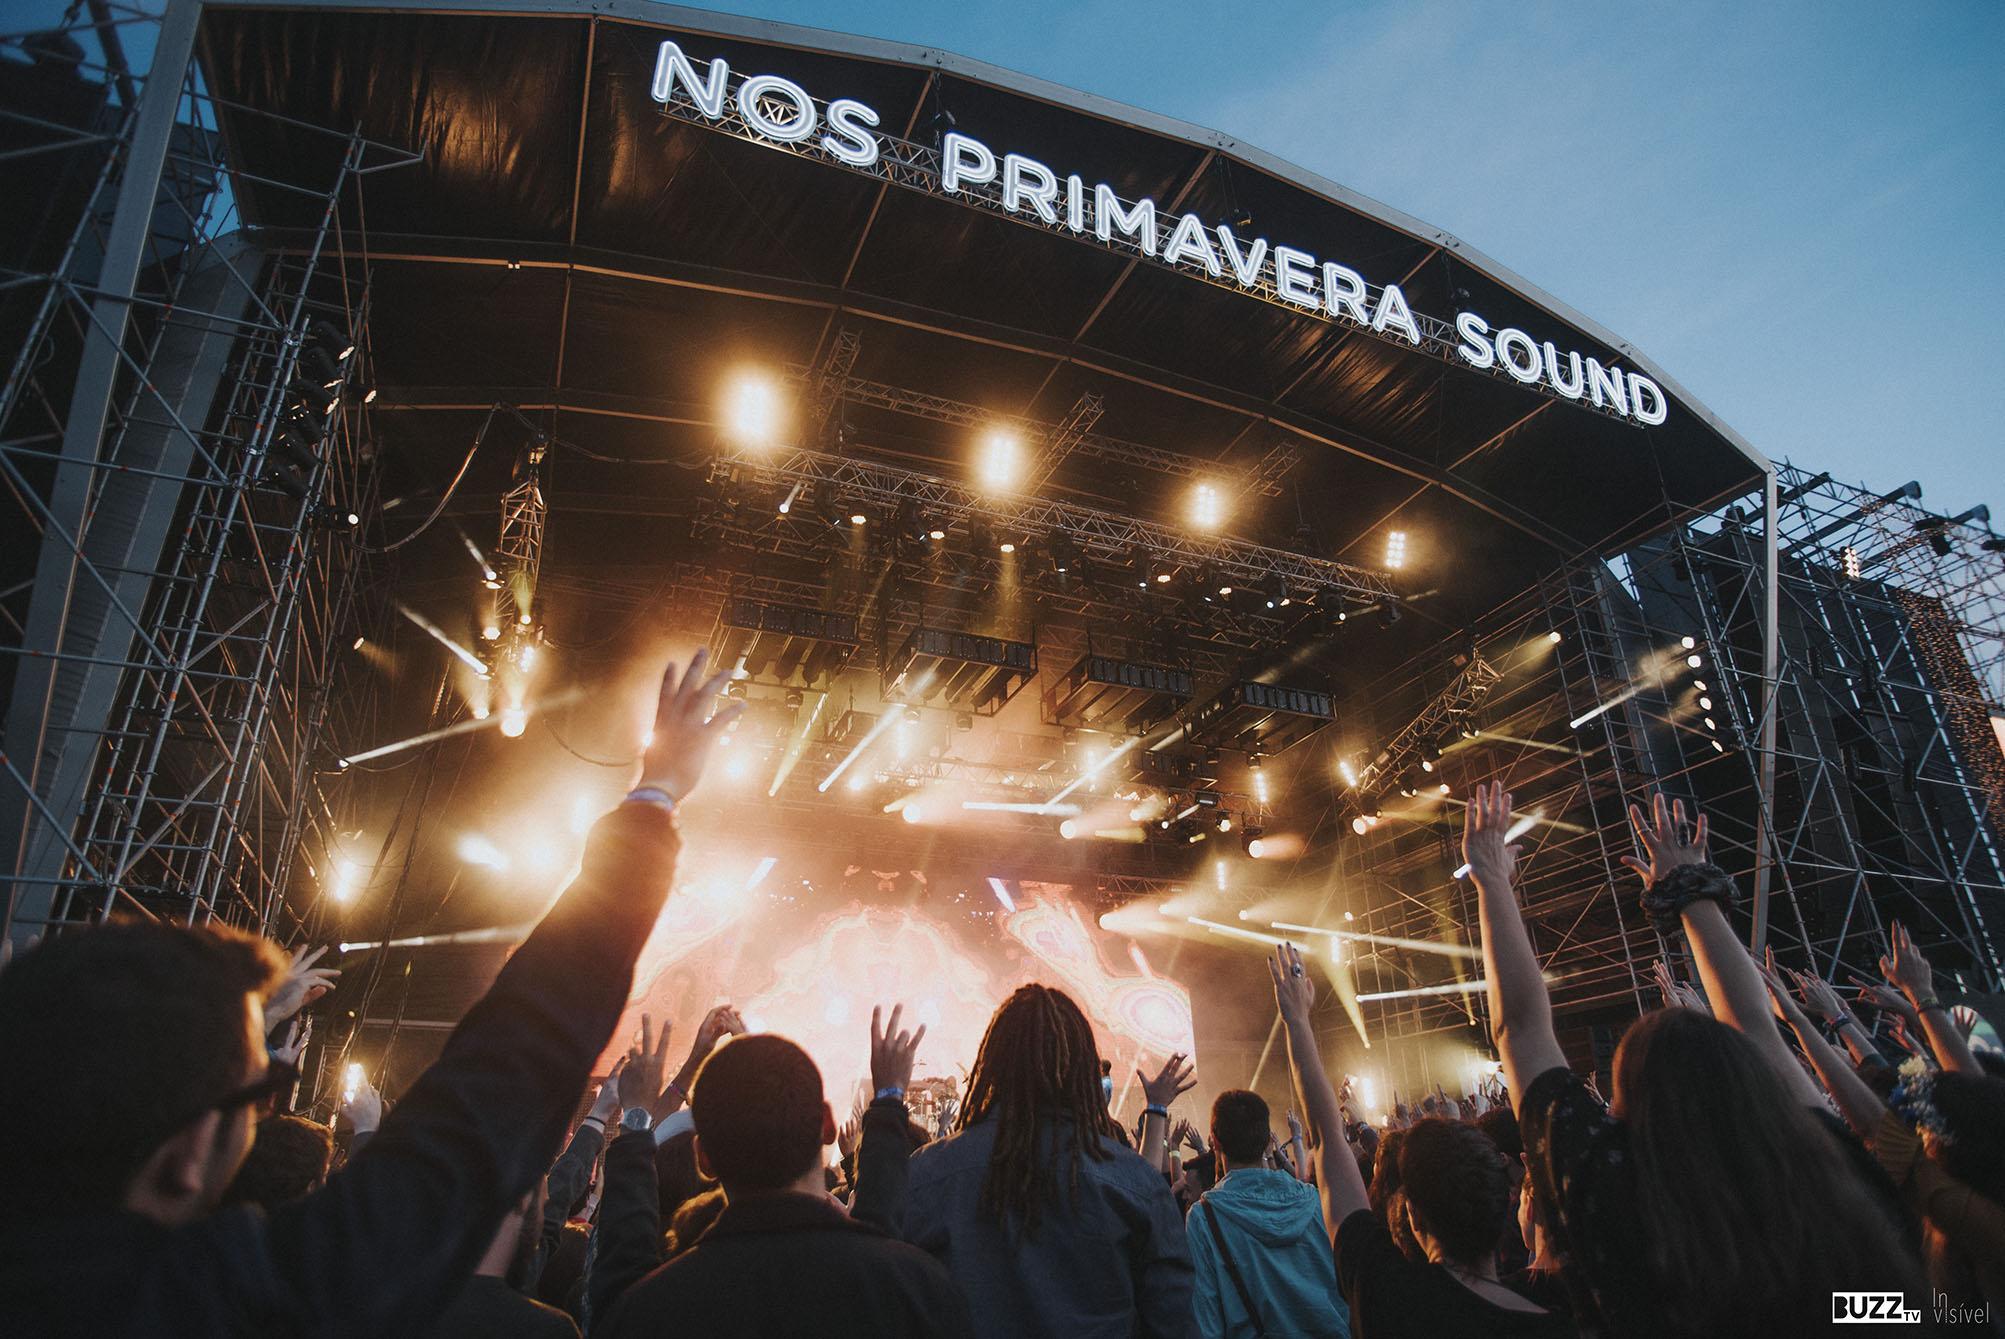 NOS Primavera Sound Porto 2017